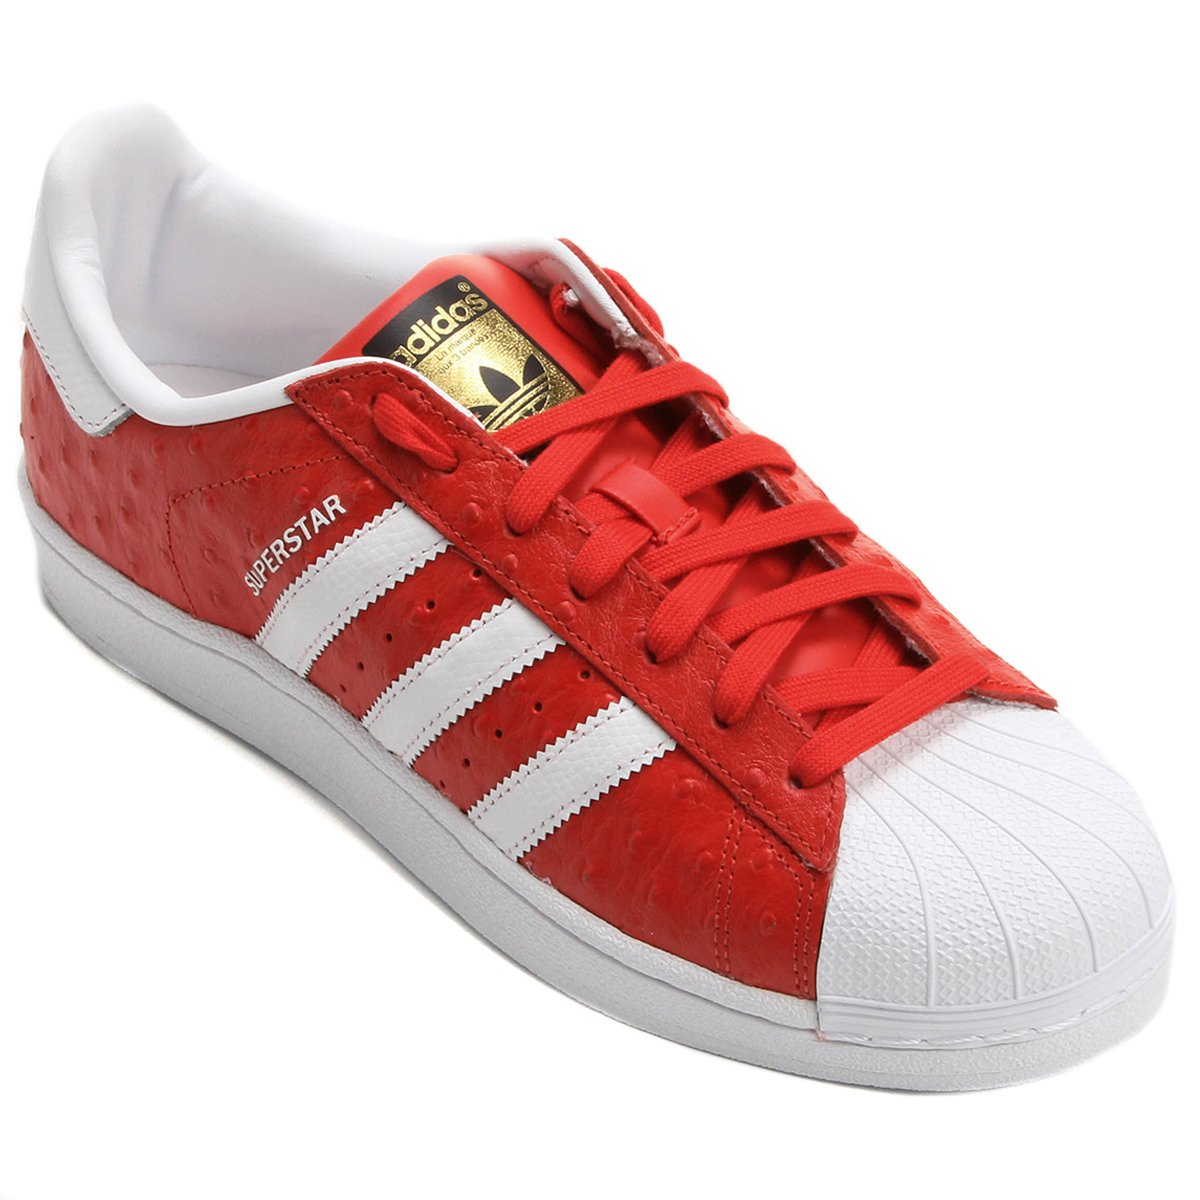 1cd7ff91b17 Tênis Adidas Superstar Animal Pack - Compre Agora